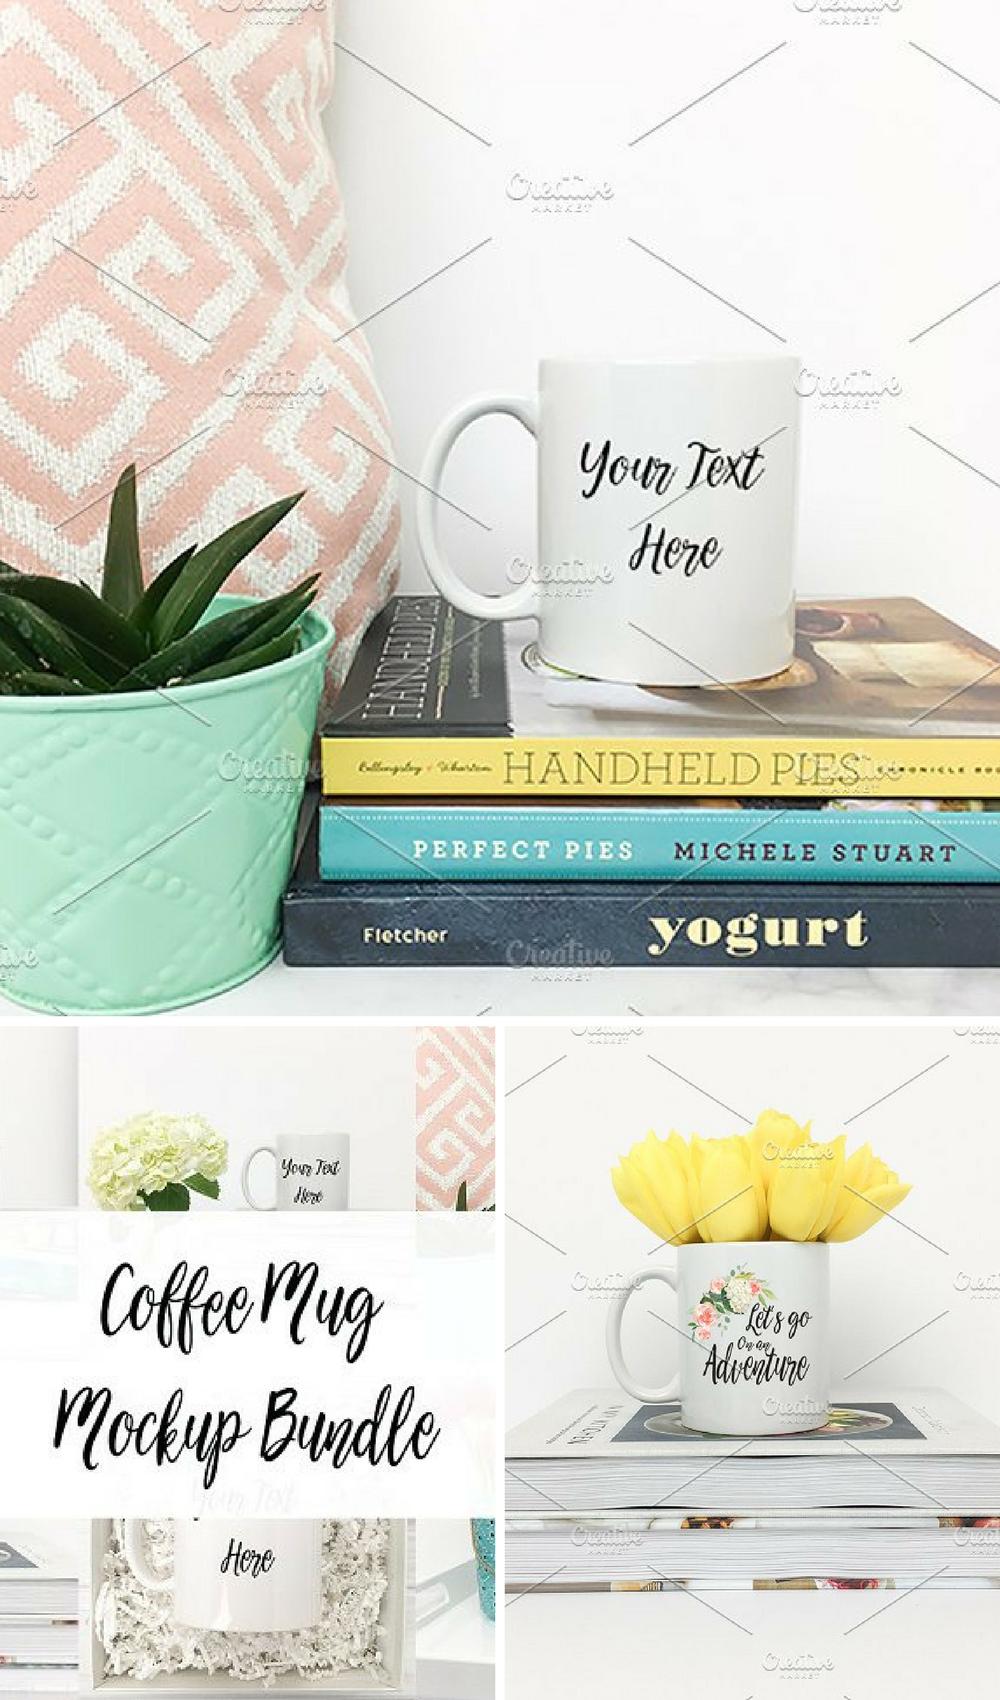 Coffee Mug Mockup Bundle These coffee mug mockup stock